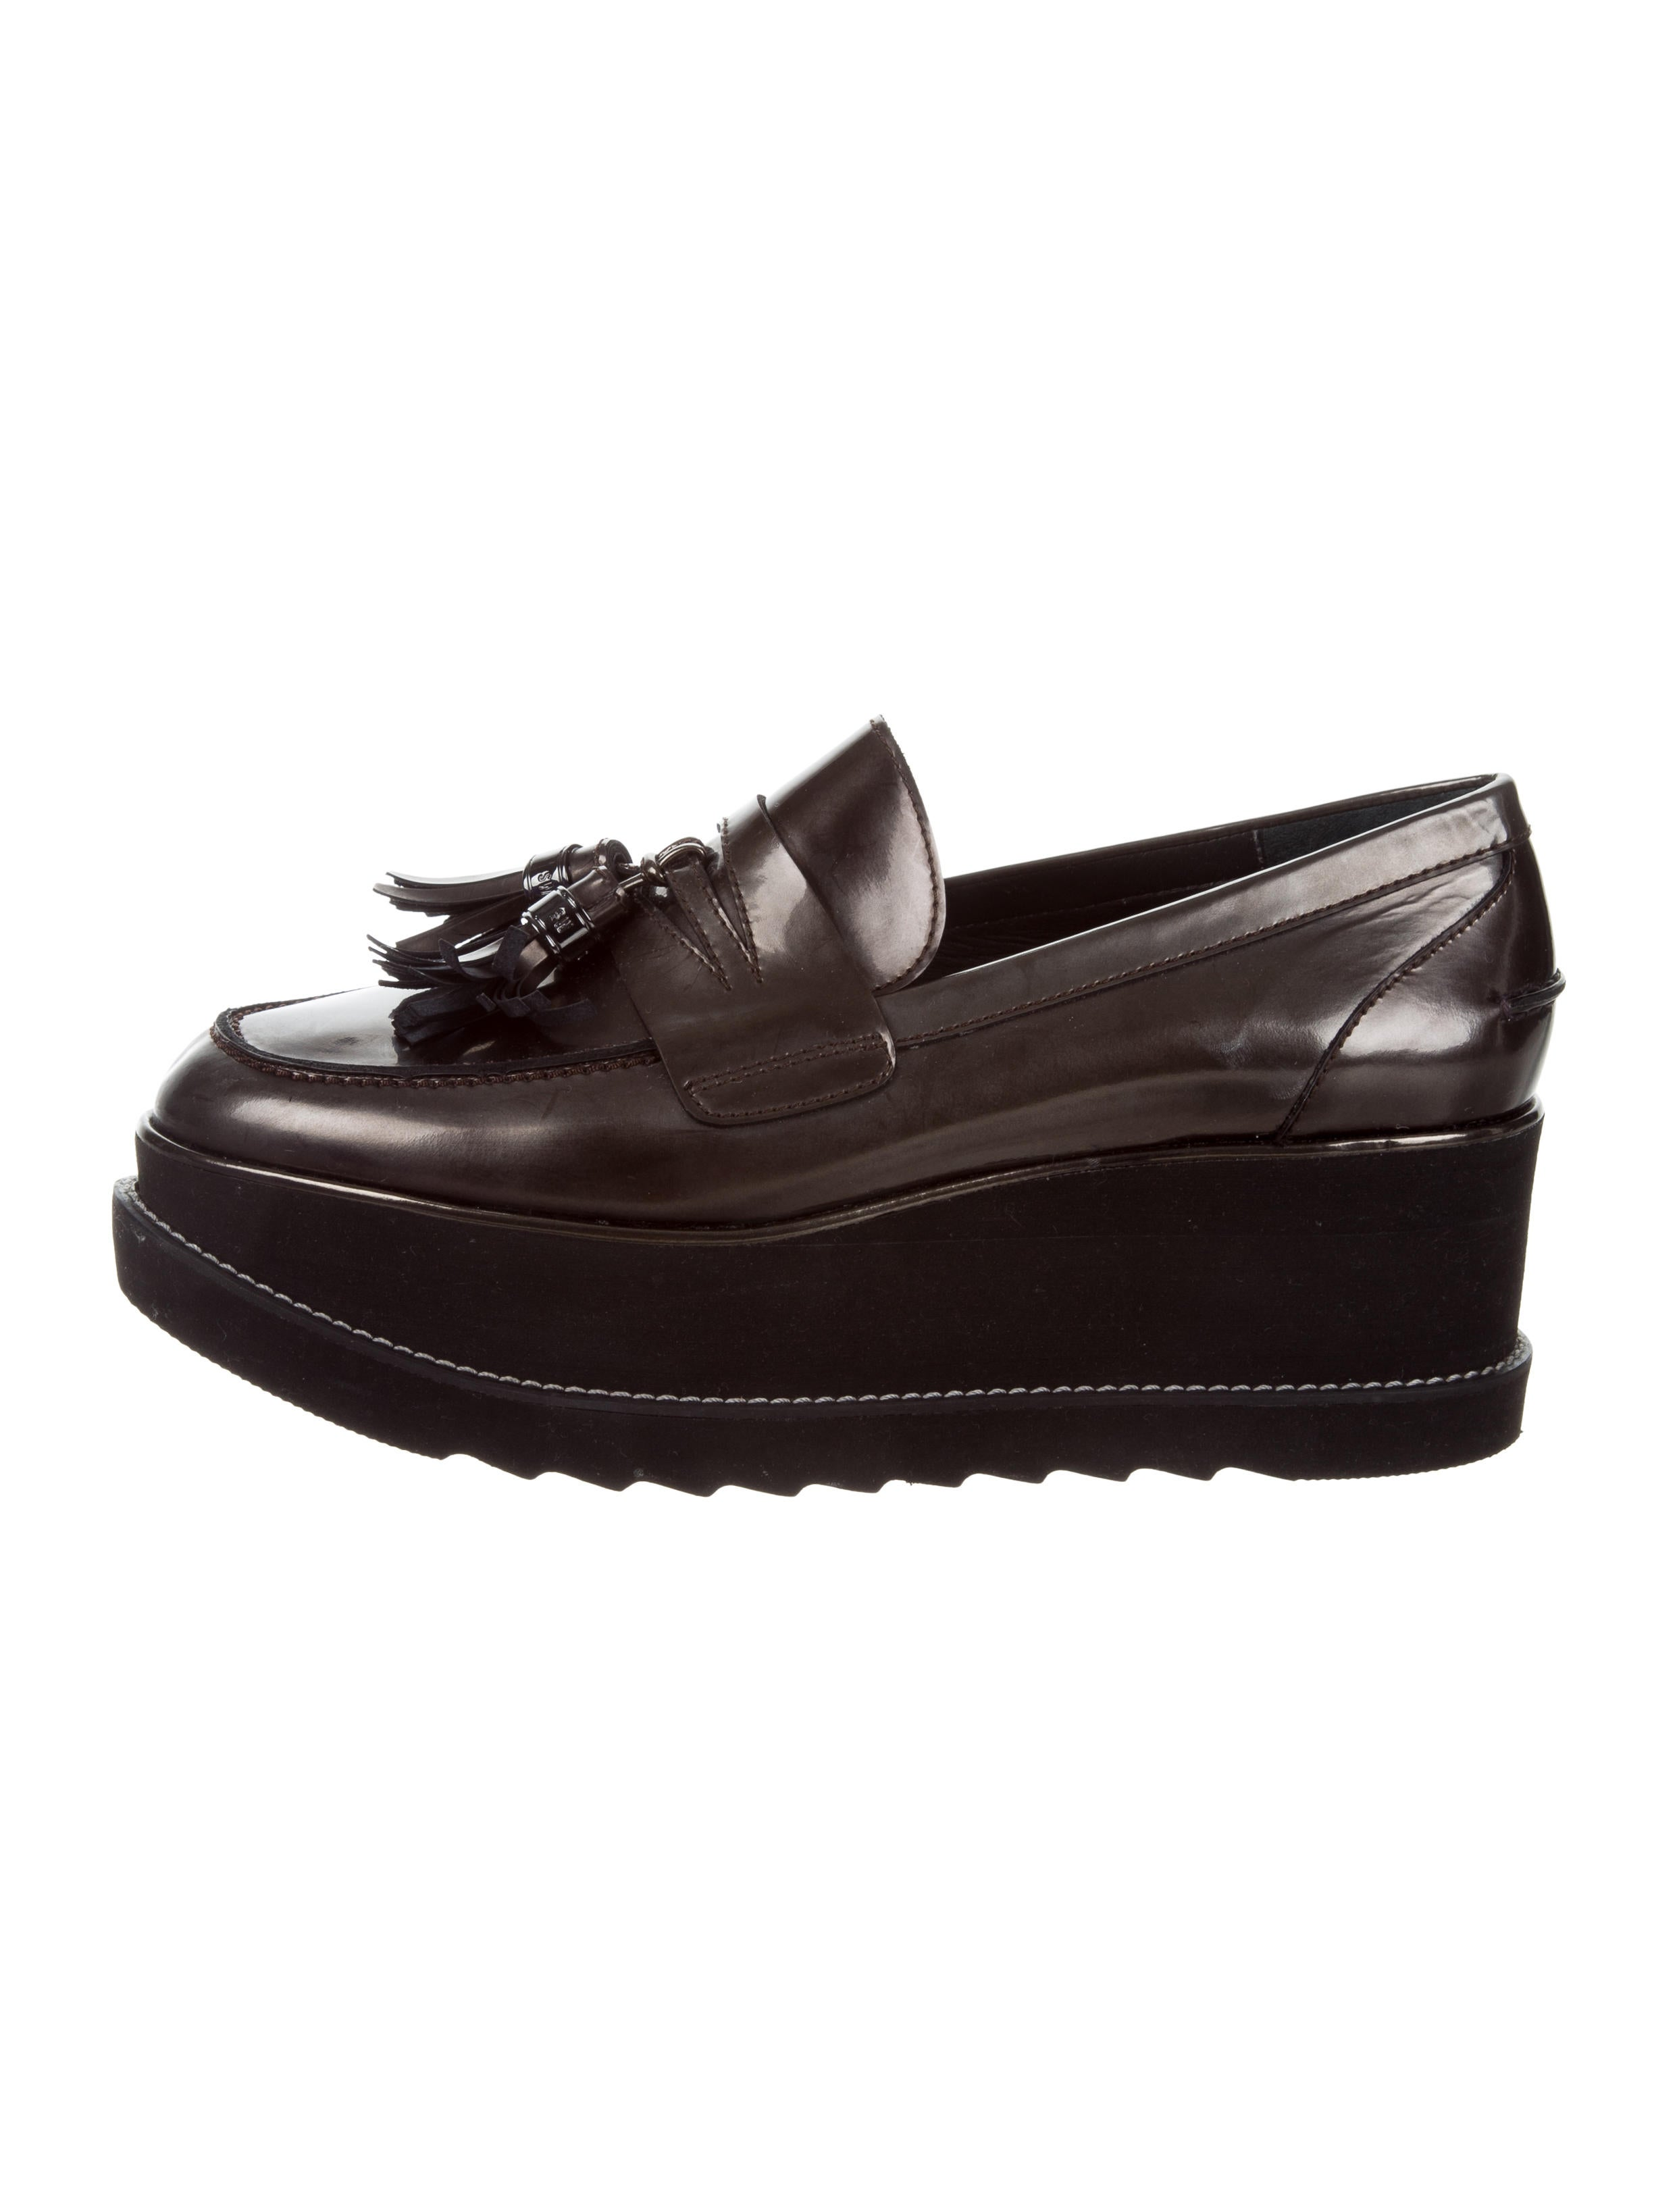 70175c089b2 Stuart Weitzman Manila Platform Loafers - Shoes - WSU36788